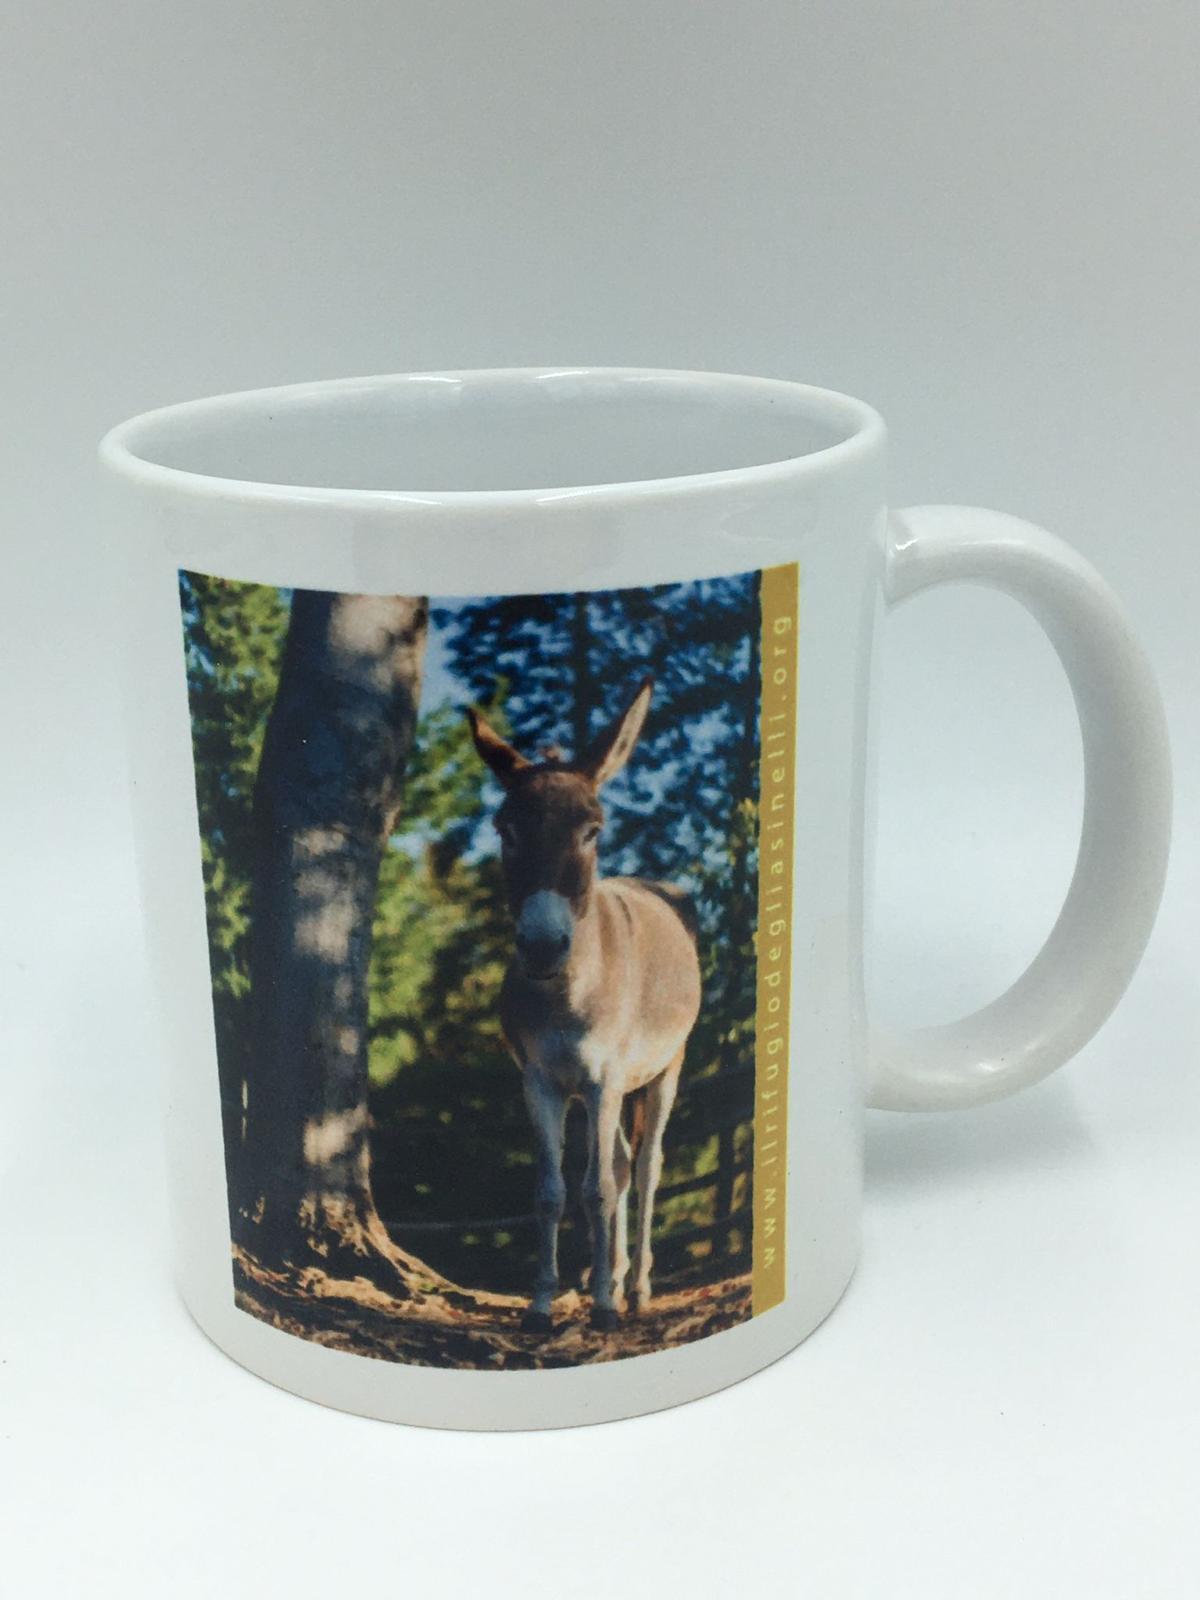 Ceramic mug with image of Viola